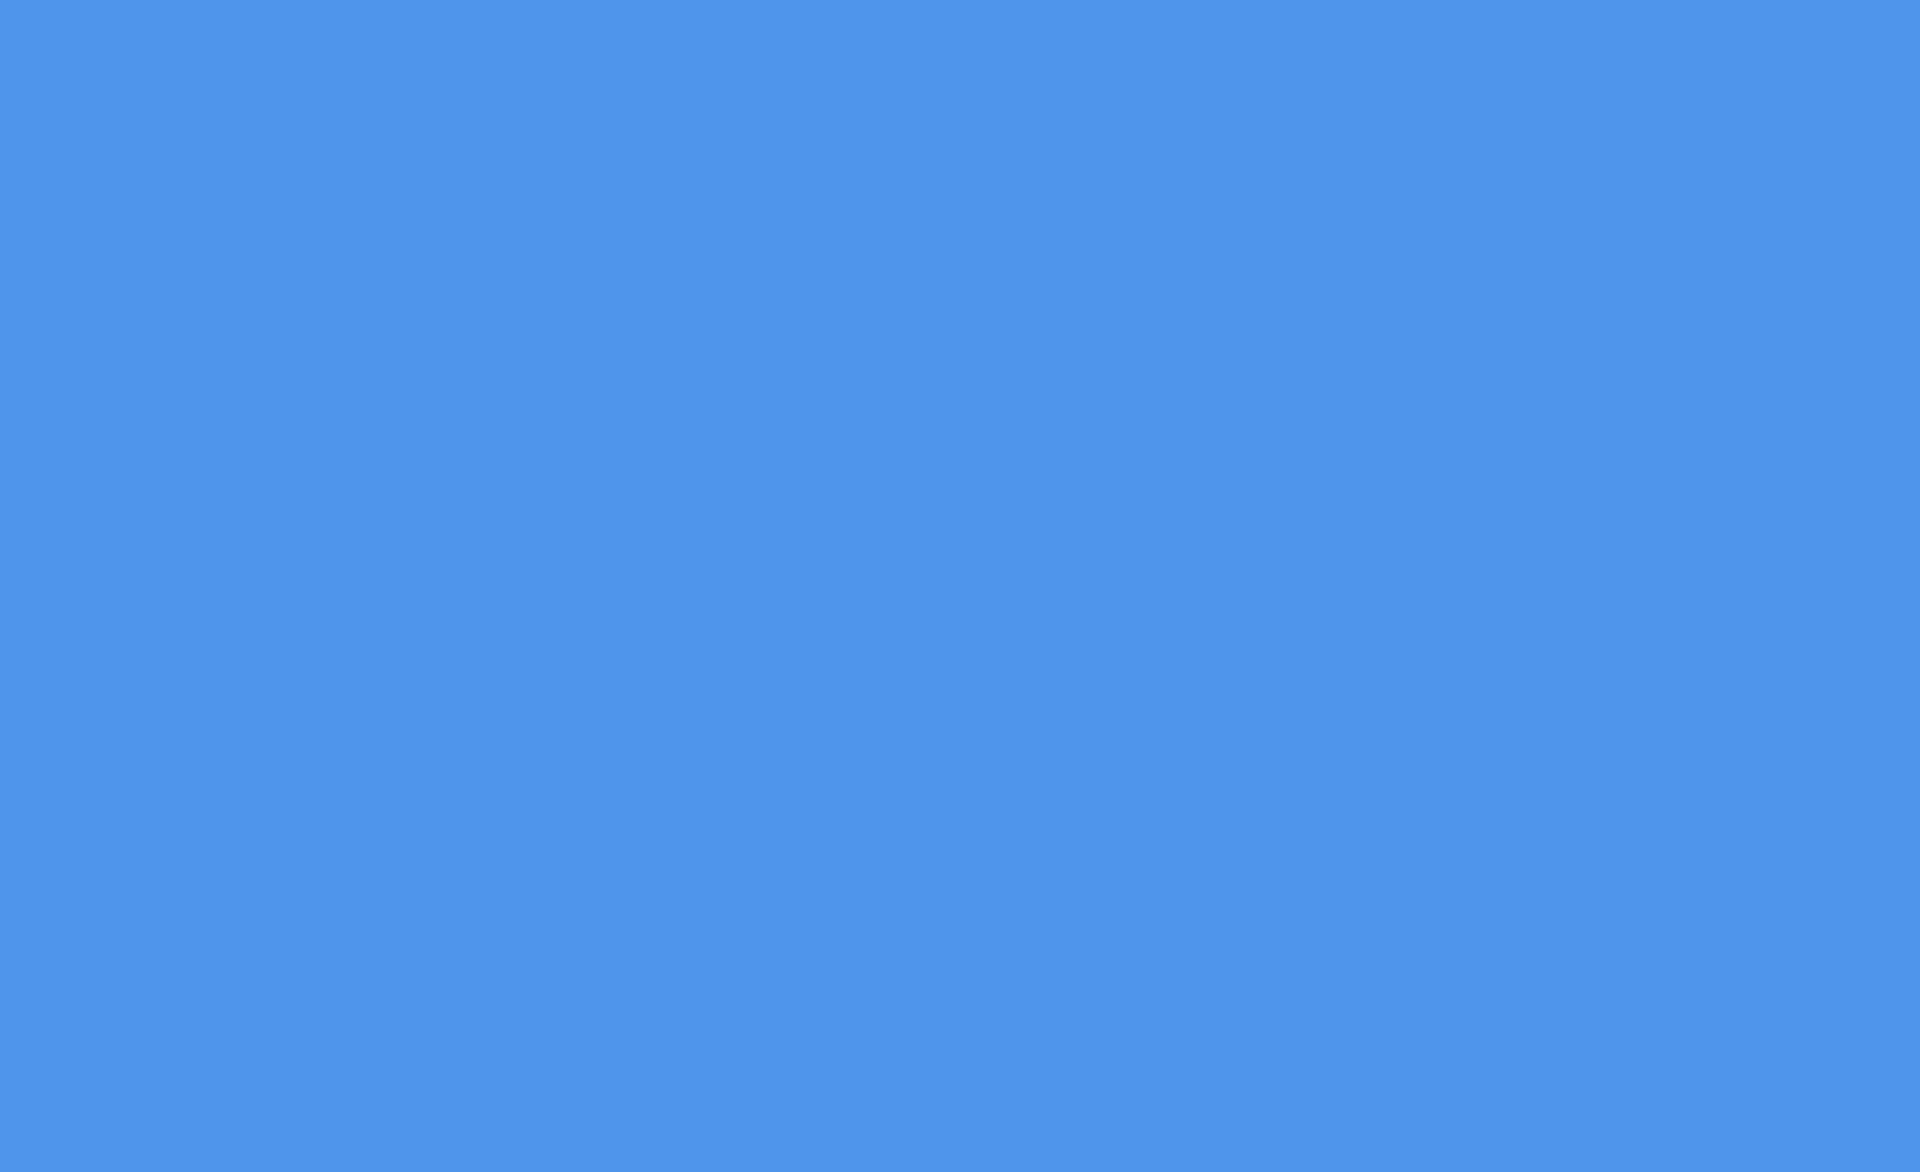 DONNA Blue Background